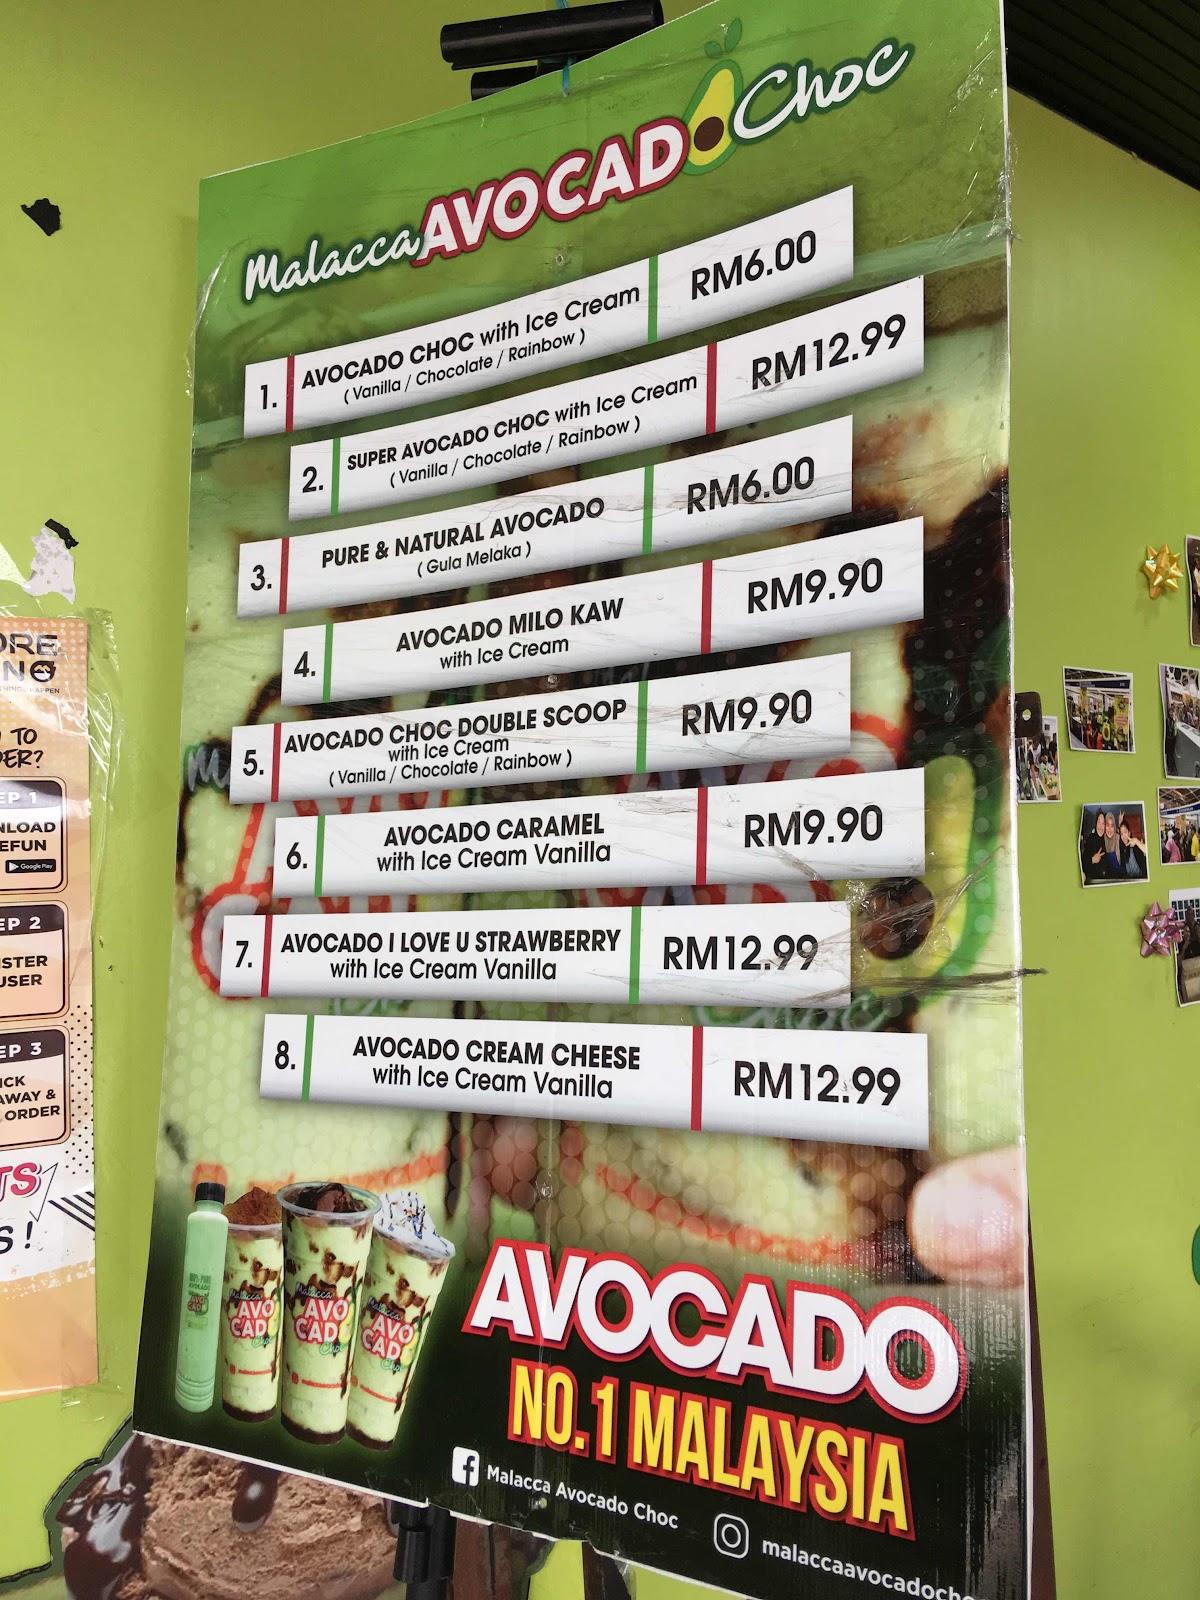 malacca avocado choc viral